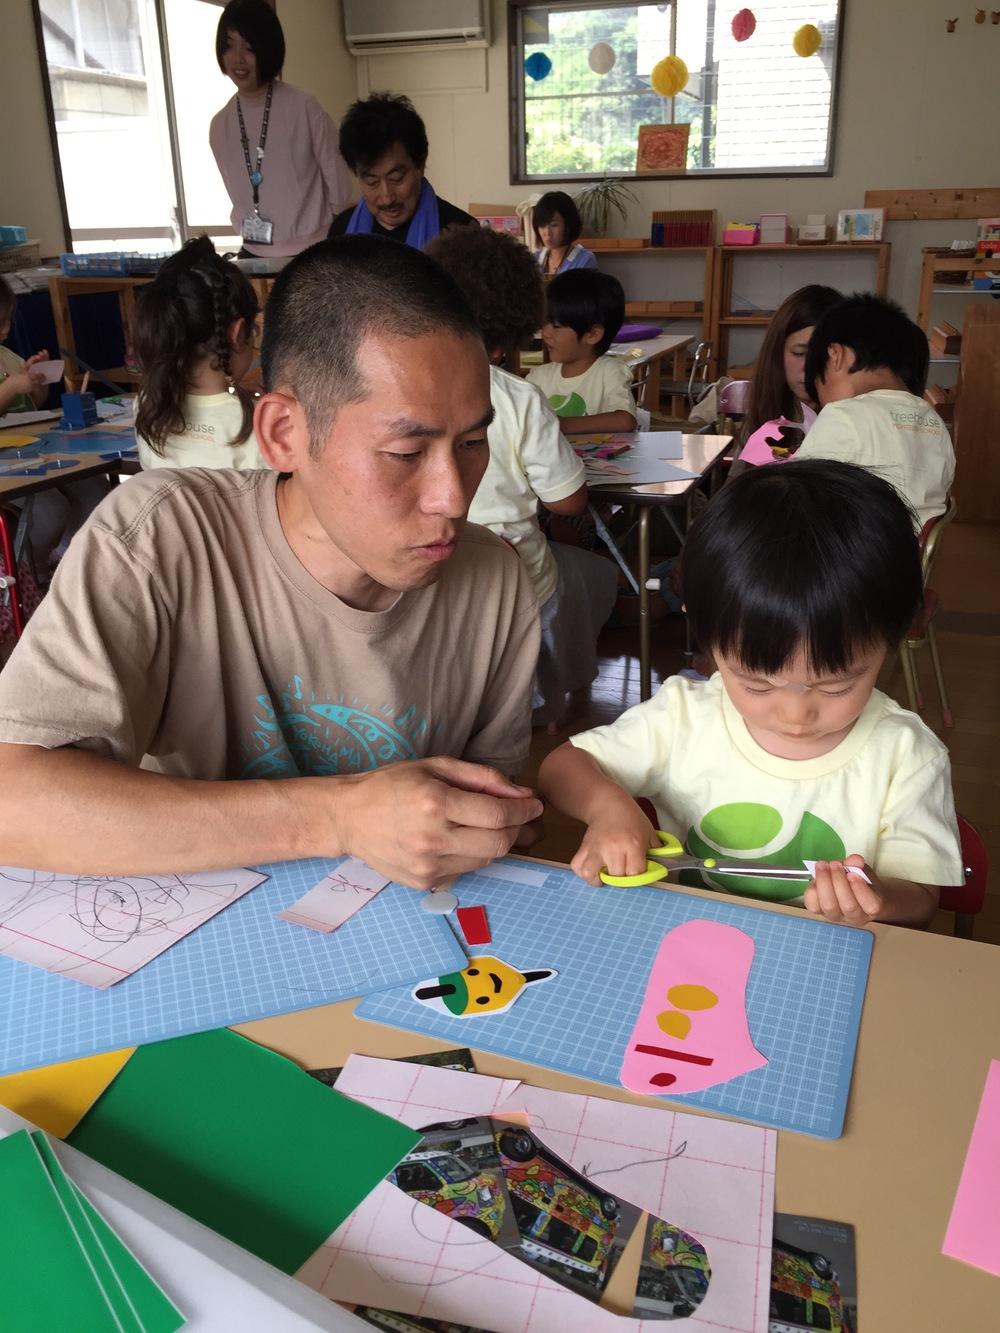 Mr. Monji assisting a Ladybug student.